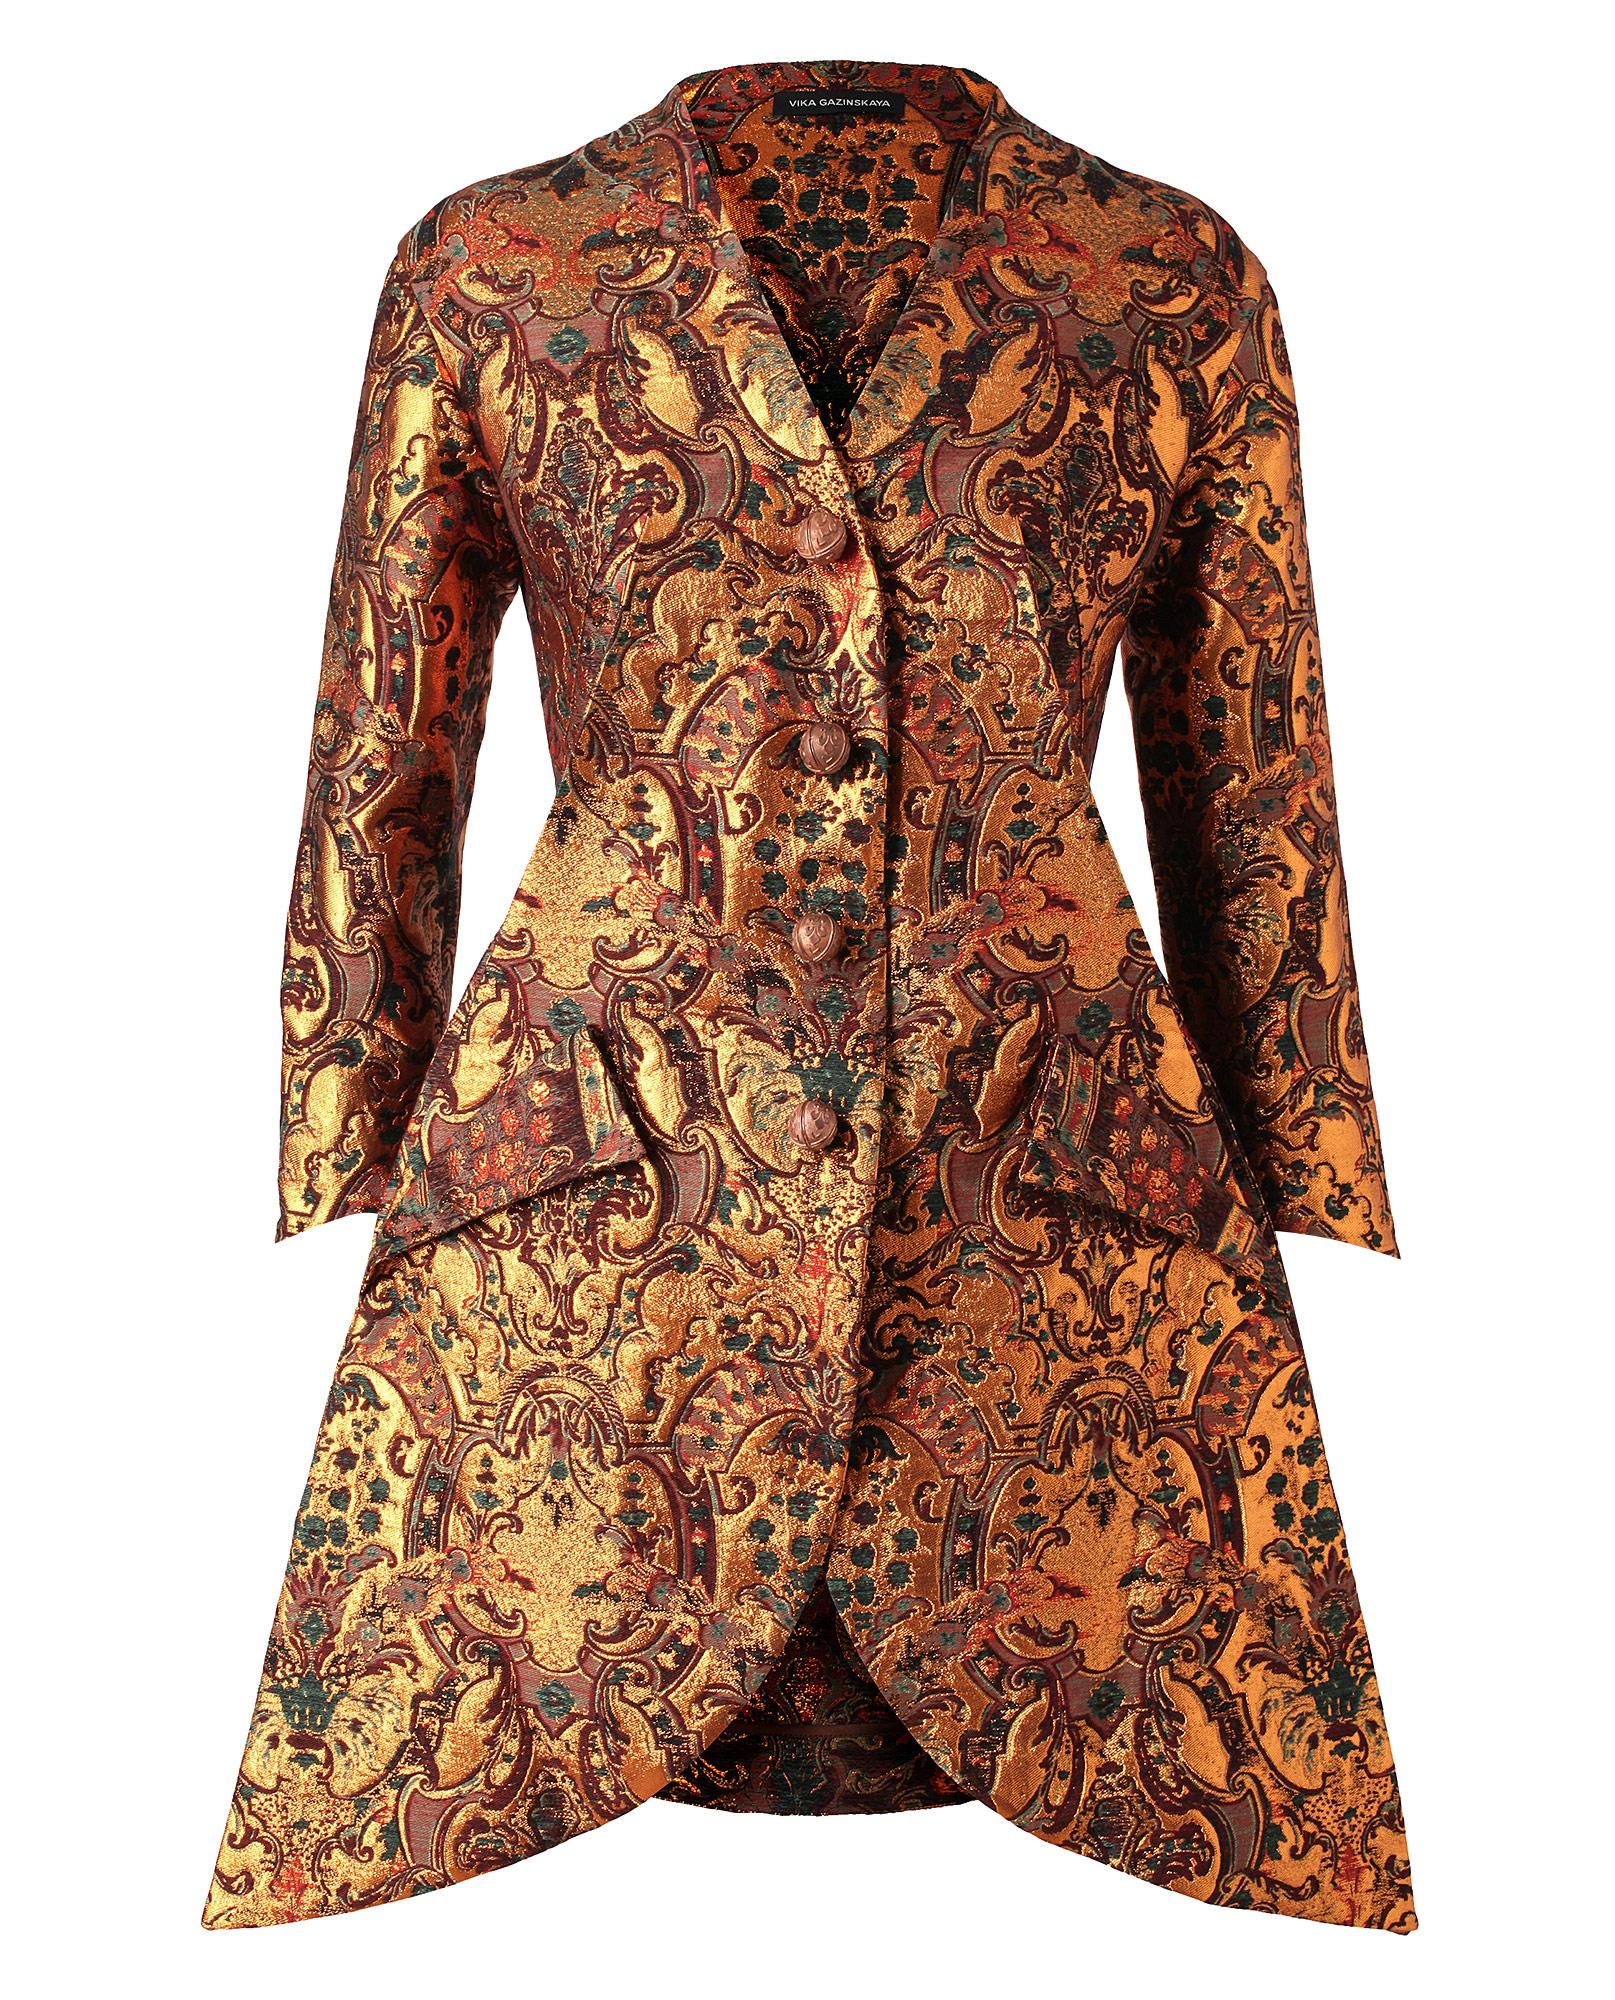 Vika Gazinskaya Tailored Wool Silk Metallic Brocade Jacket ...